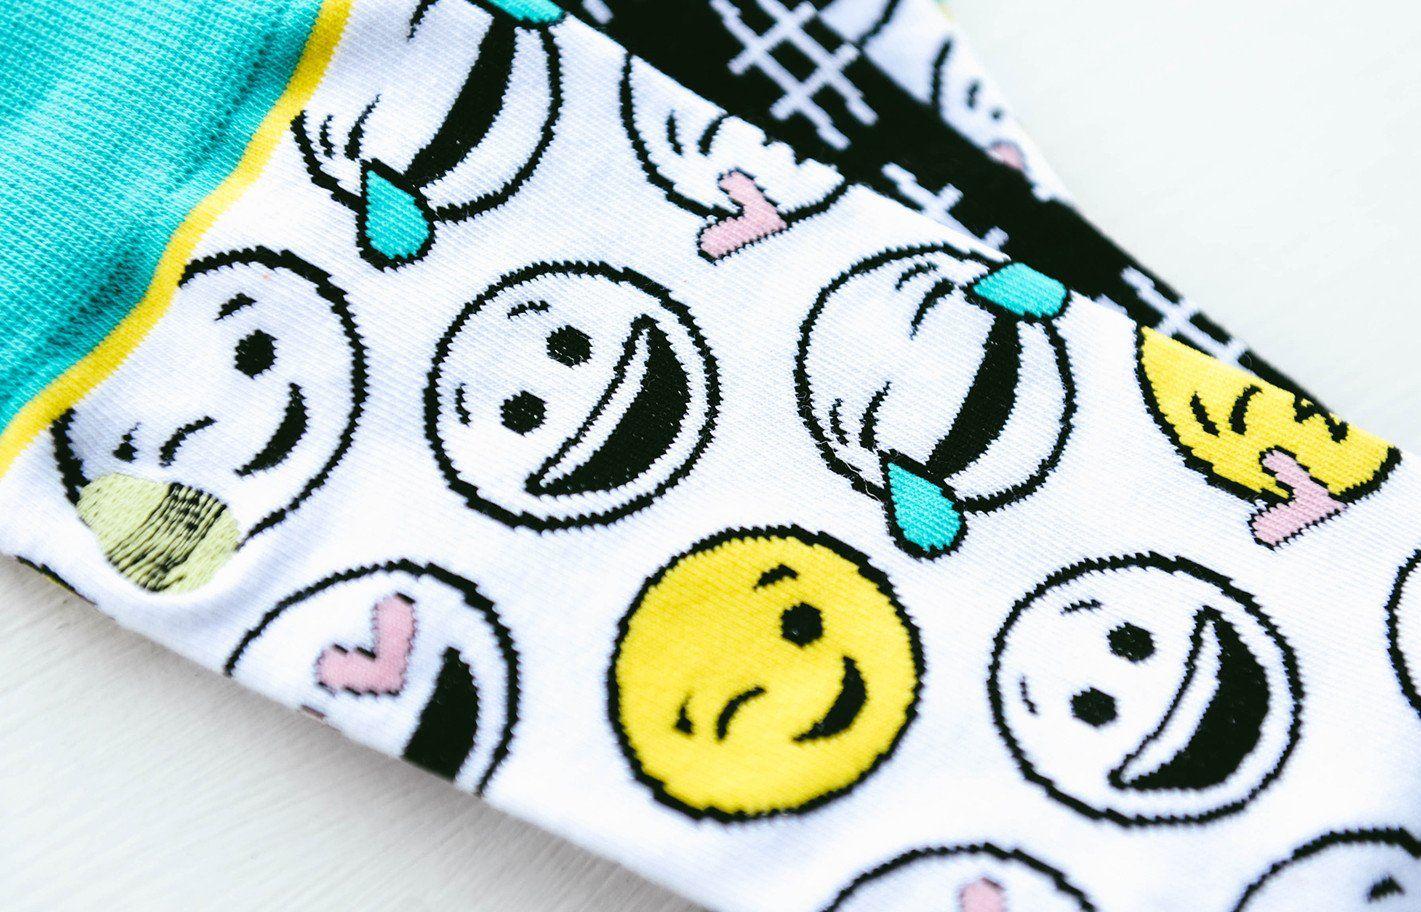 Emoji socks extra padding cute hashtag print on